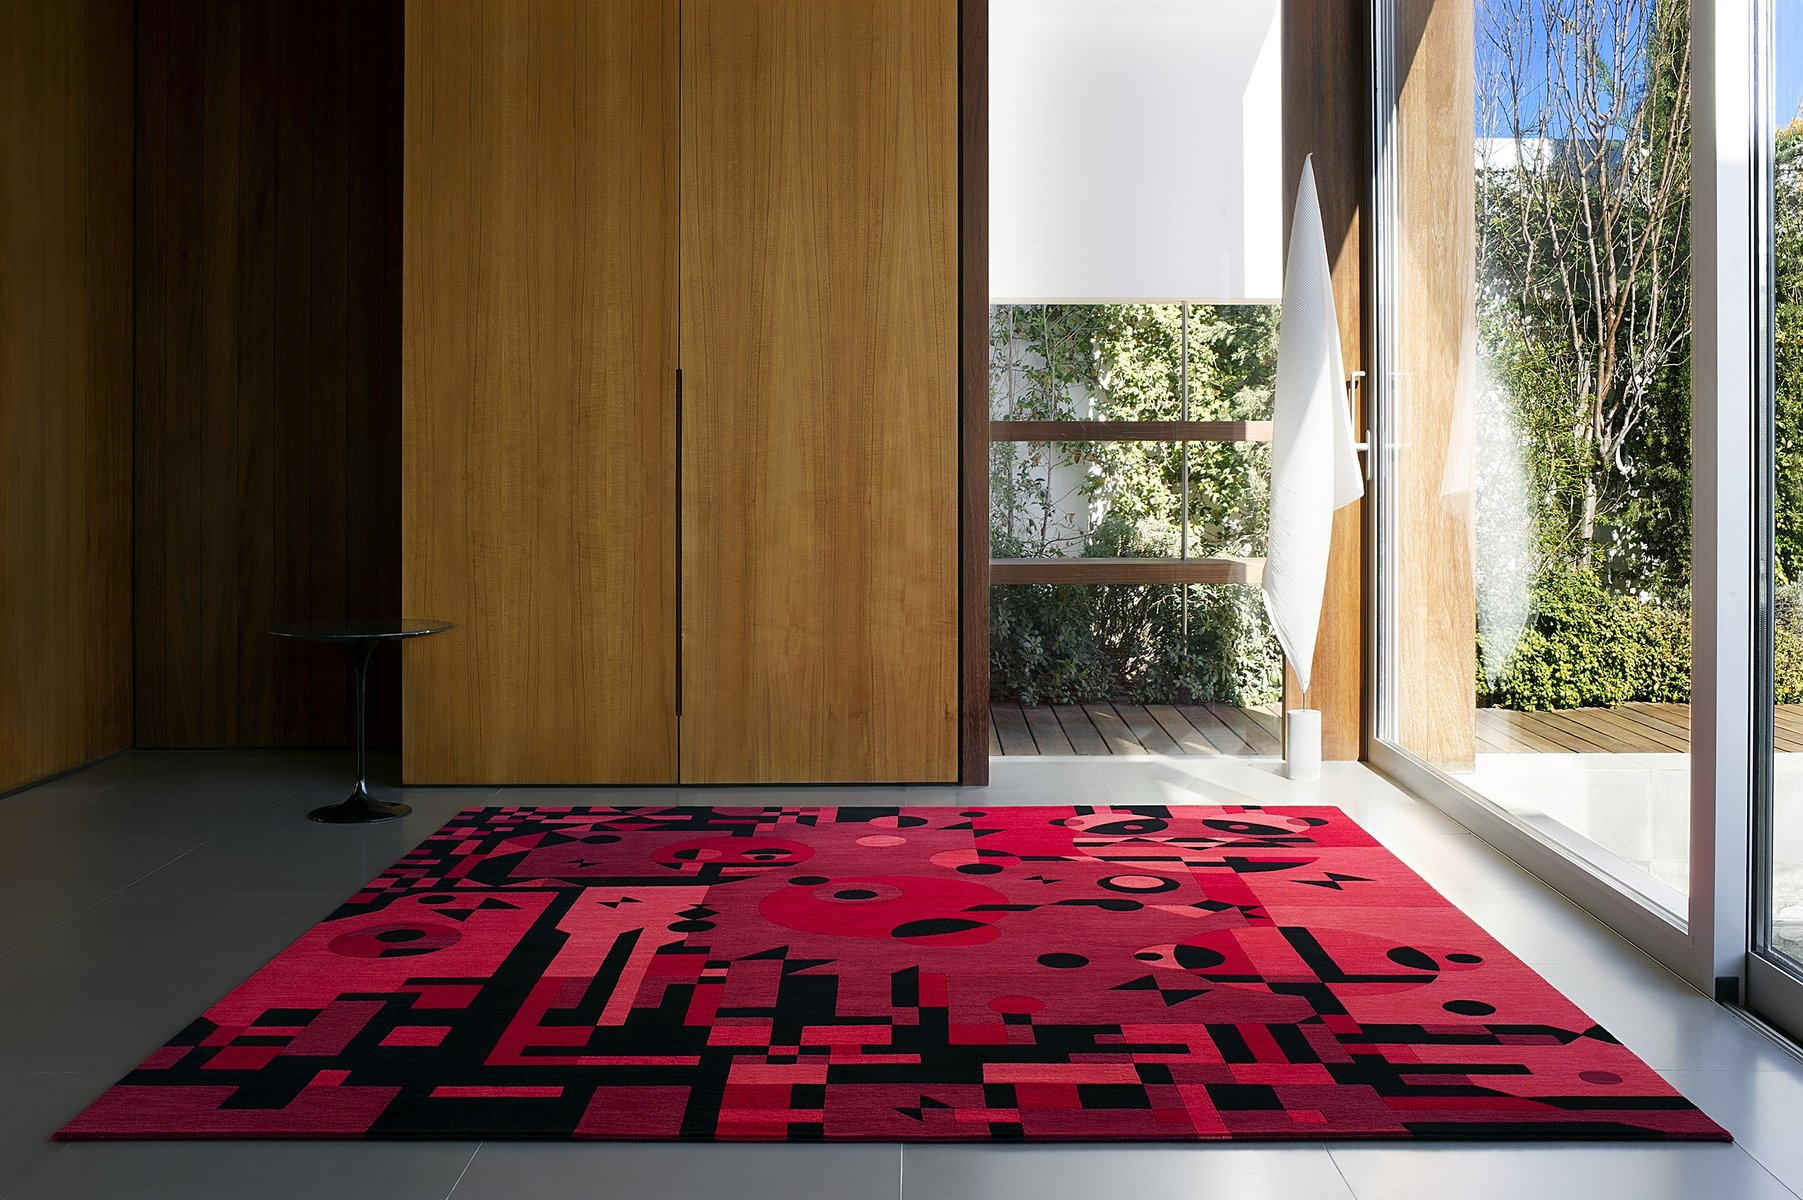 red rays teppich von kostas neofitidis f r kota collections bei pamono kaufen. Black Bedroom Furniture Sets. Home Design Ideas